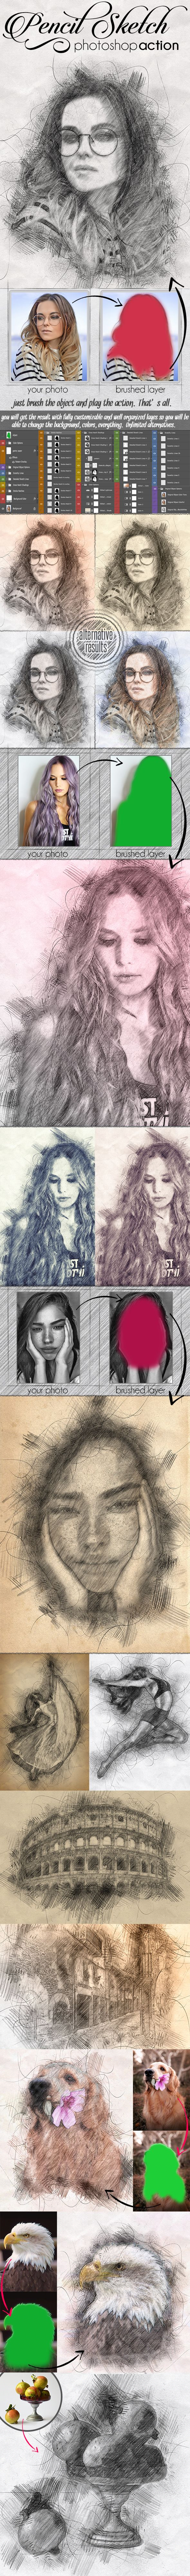 Pencil sketch effect photoshop action